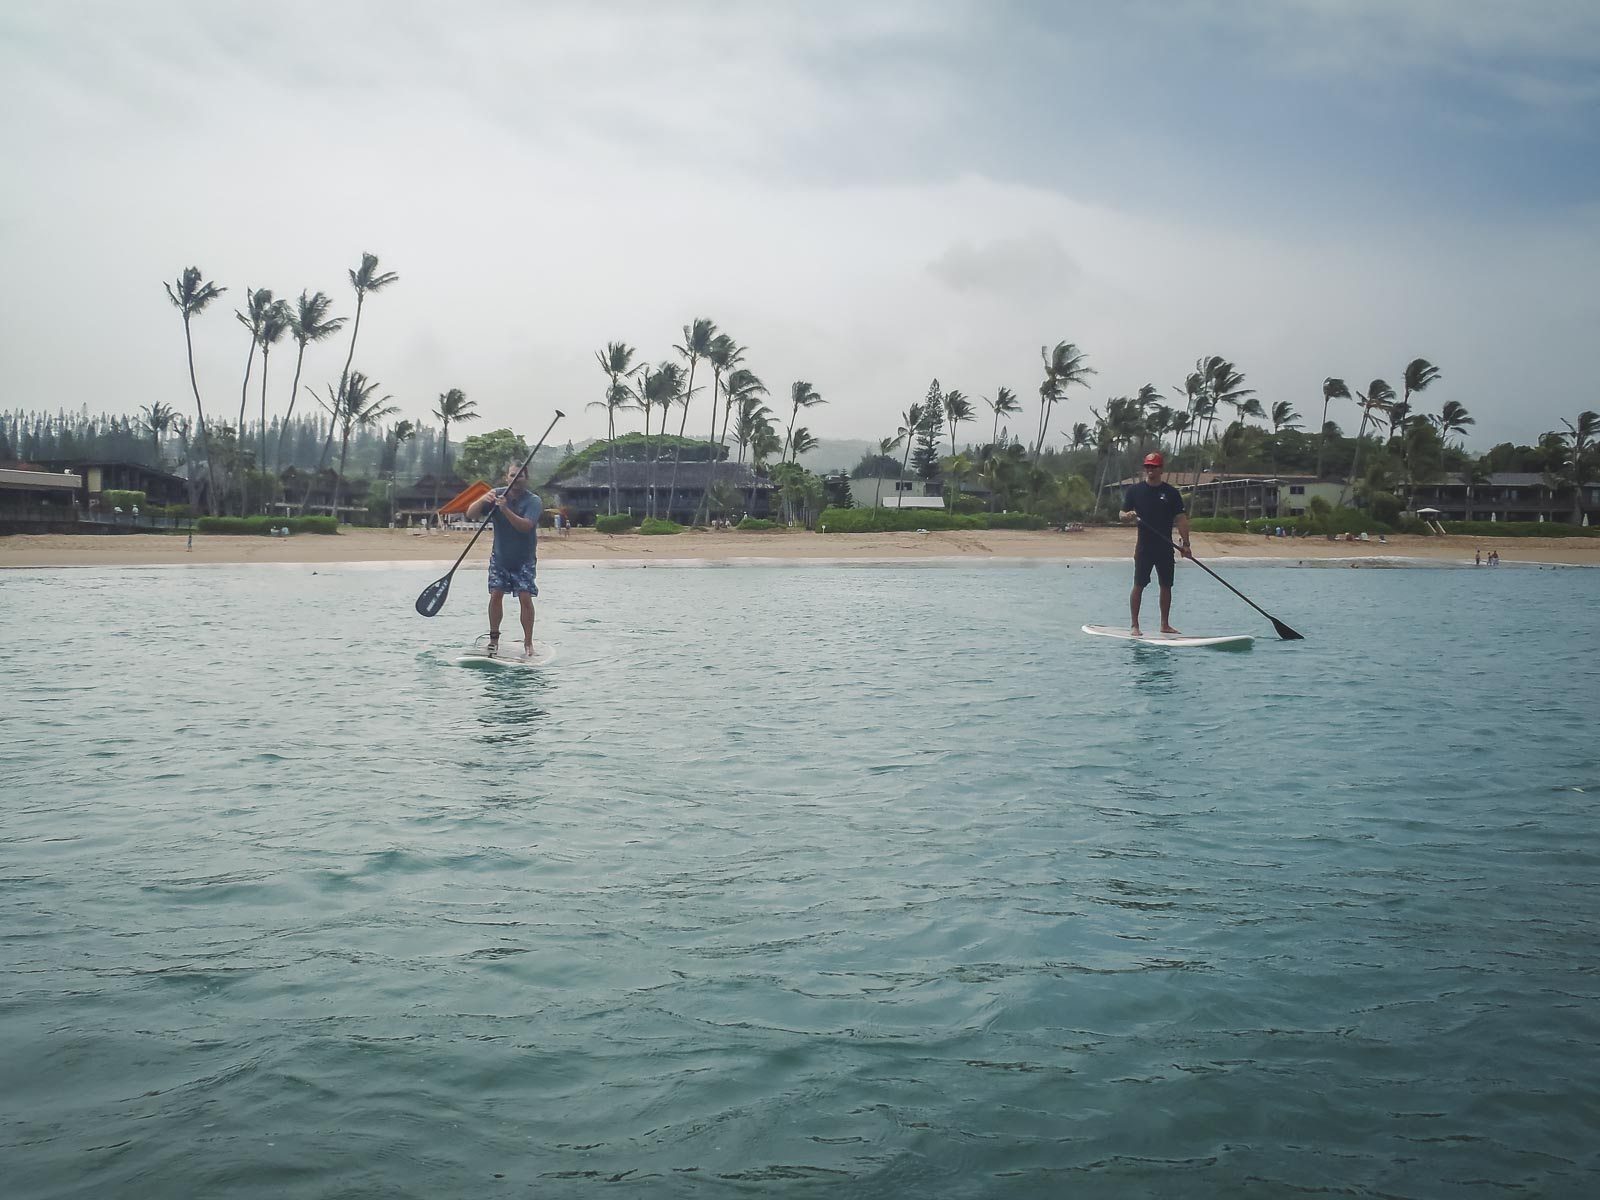 Paddleboarding at Napili Kai Maui